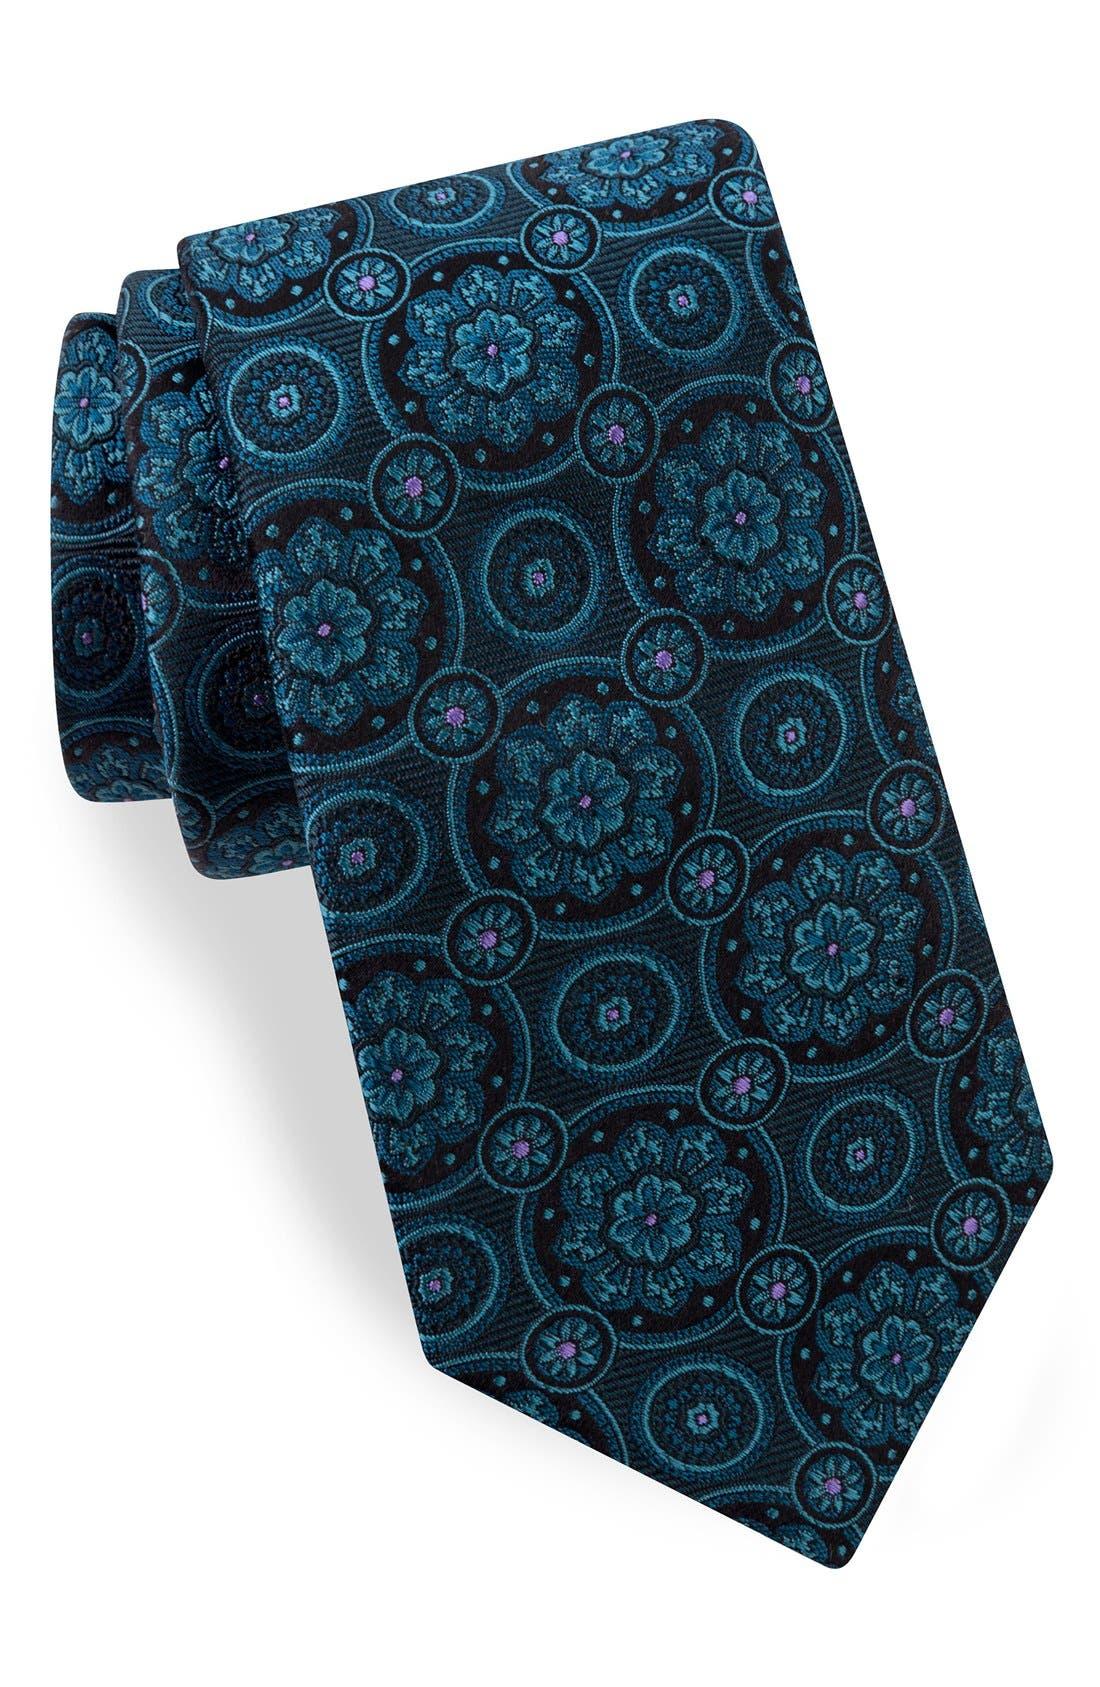 Main Image - Ted Baker London Medallion Silk Tie